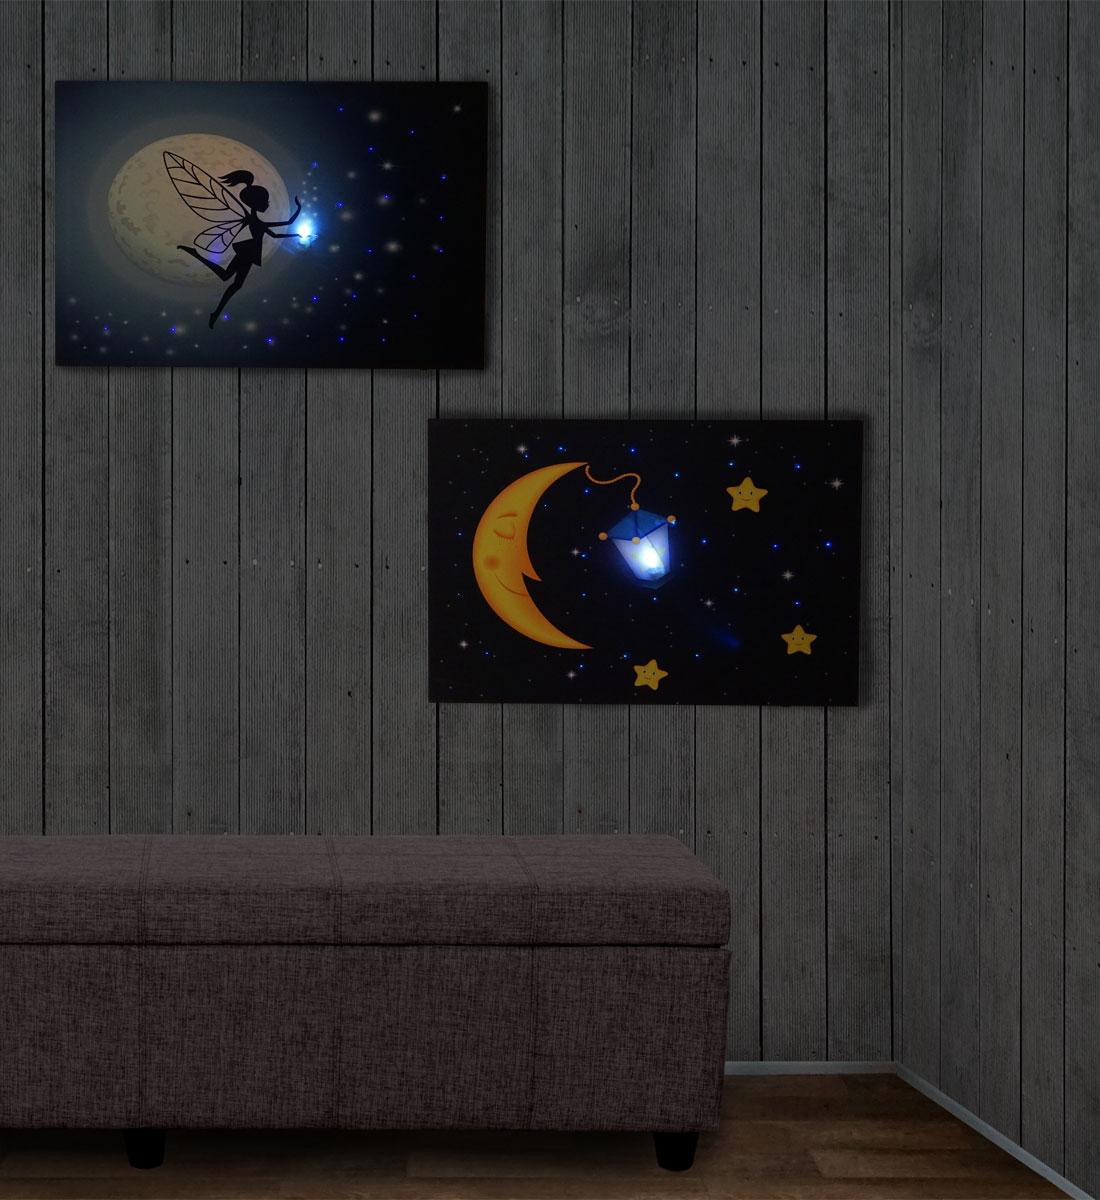 2x LED-Bild Ambiente-Bild